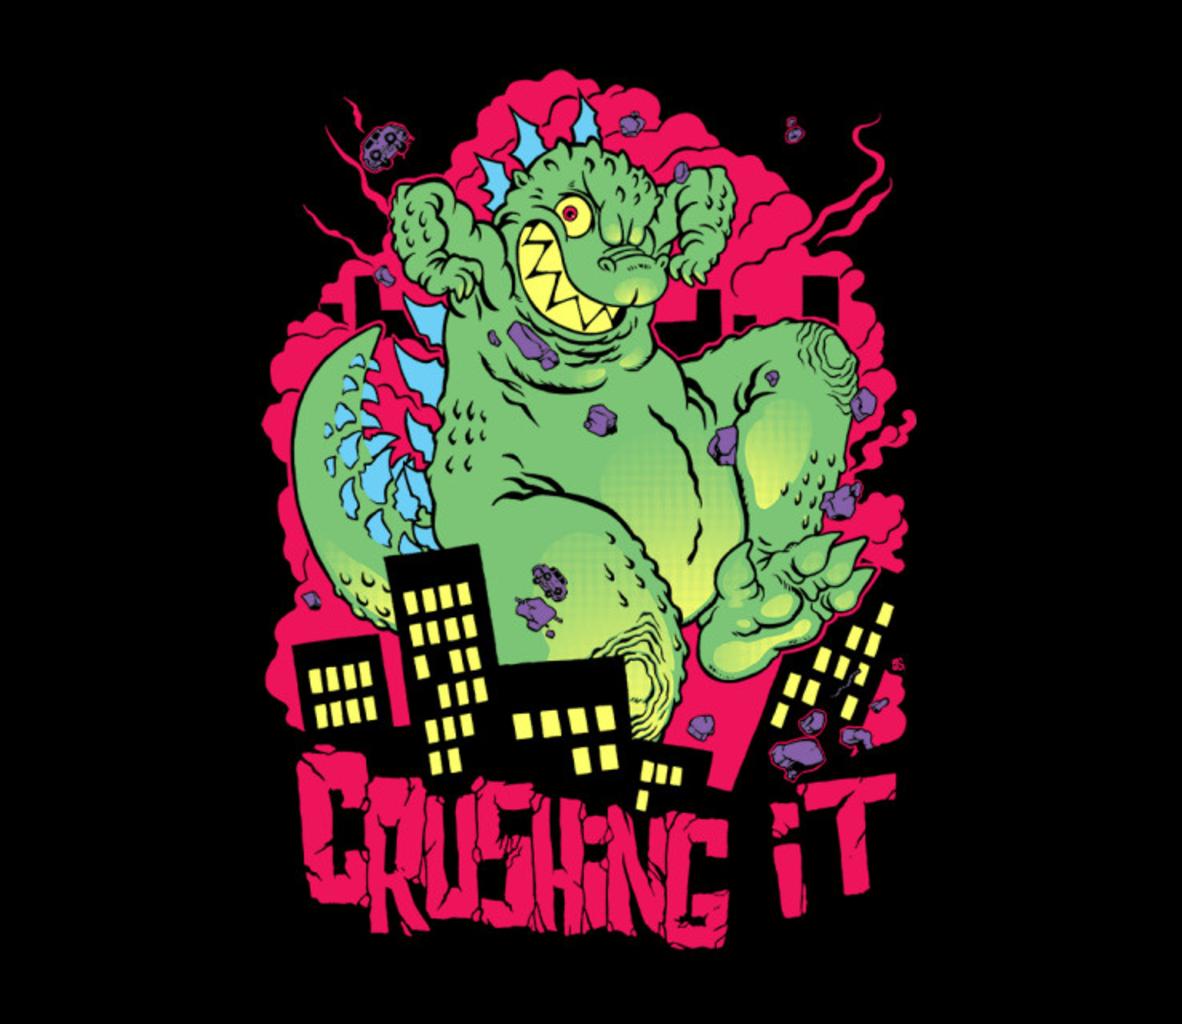 TeeFury: Crushing It